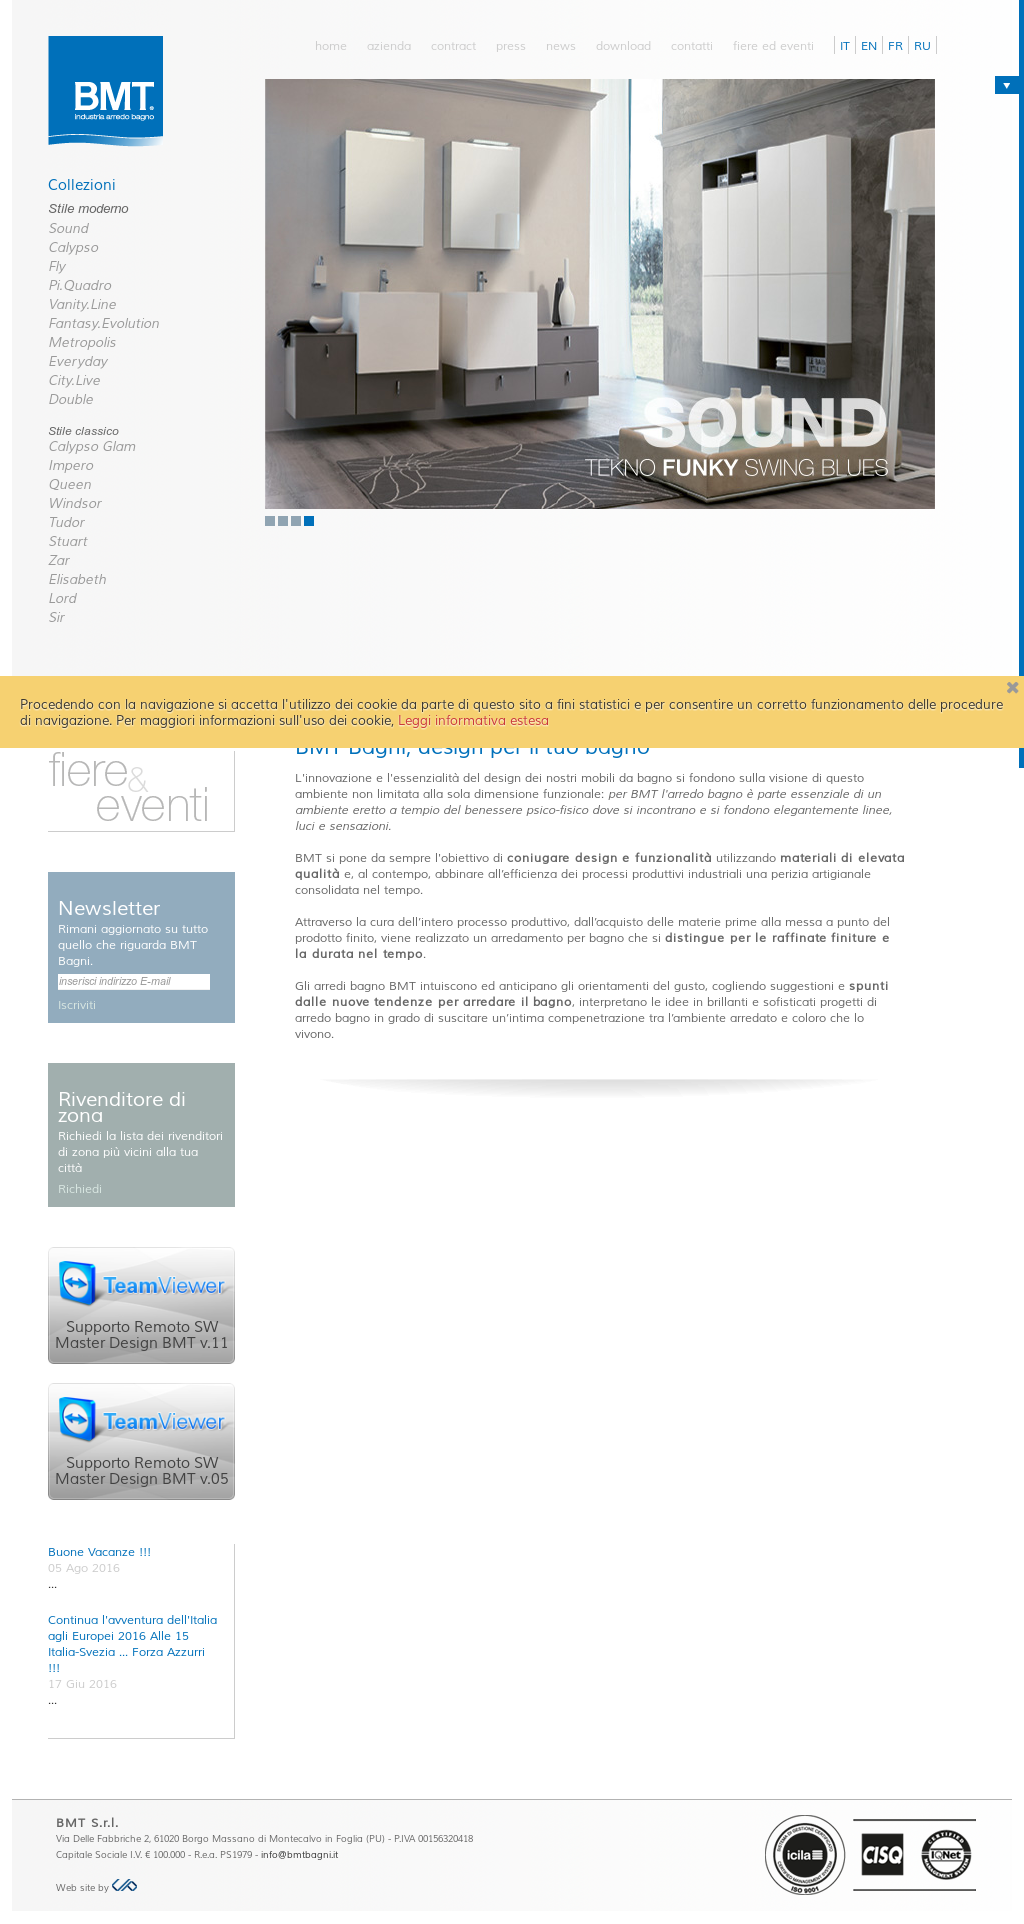 Bmt Industria Arredo Bagno.Bmt Bagni Competitors Revenue And Employees Owler Company Profile